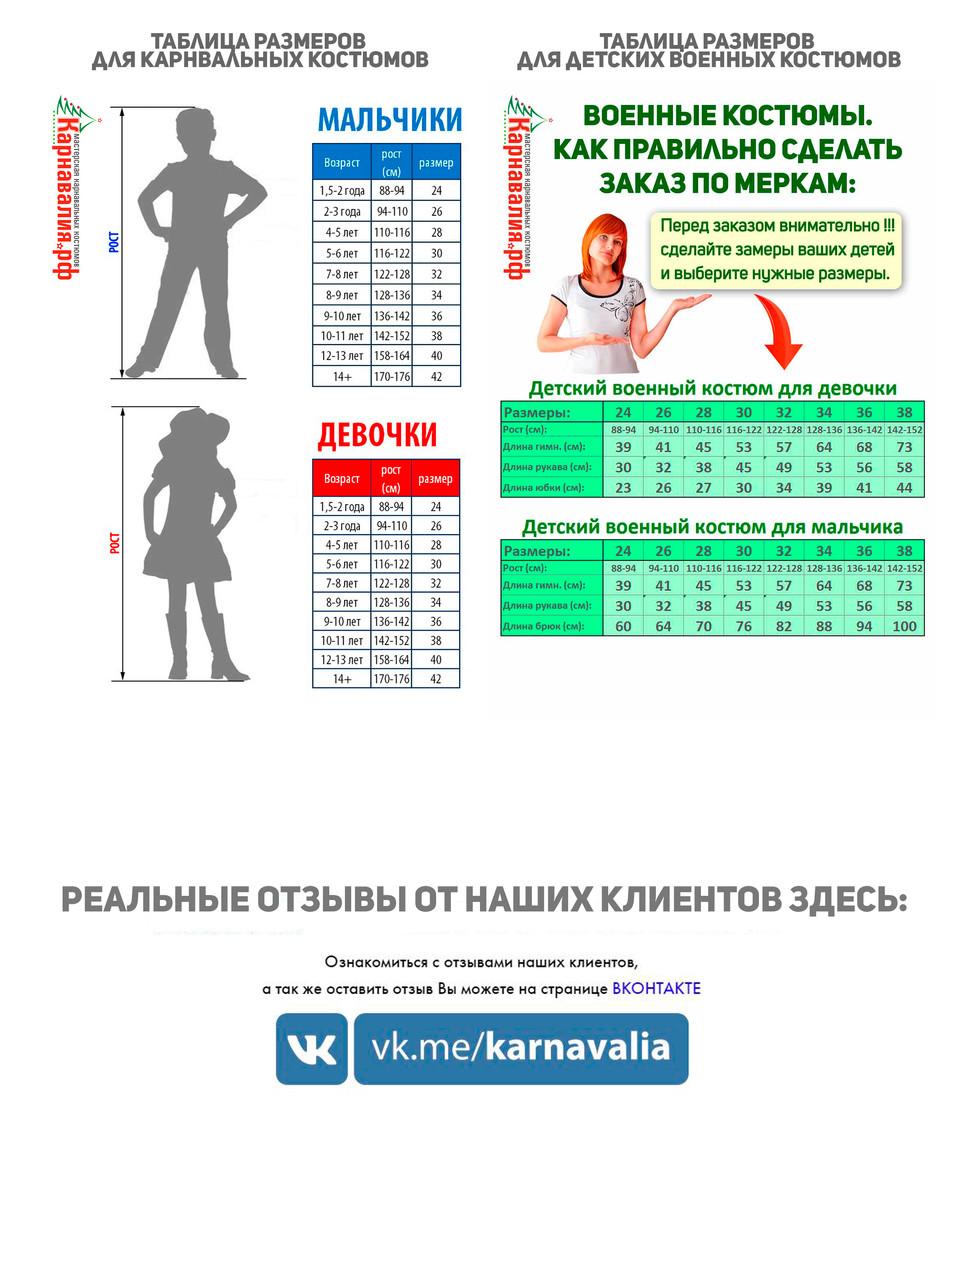 23 test-tablisa1.jpg